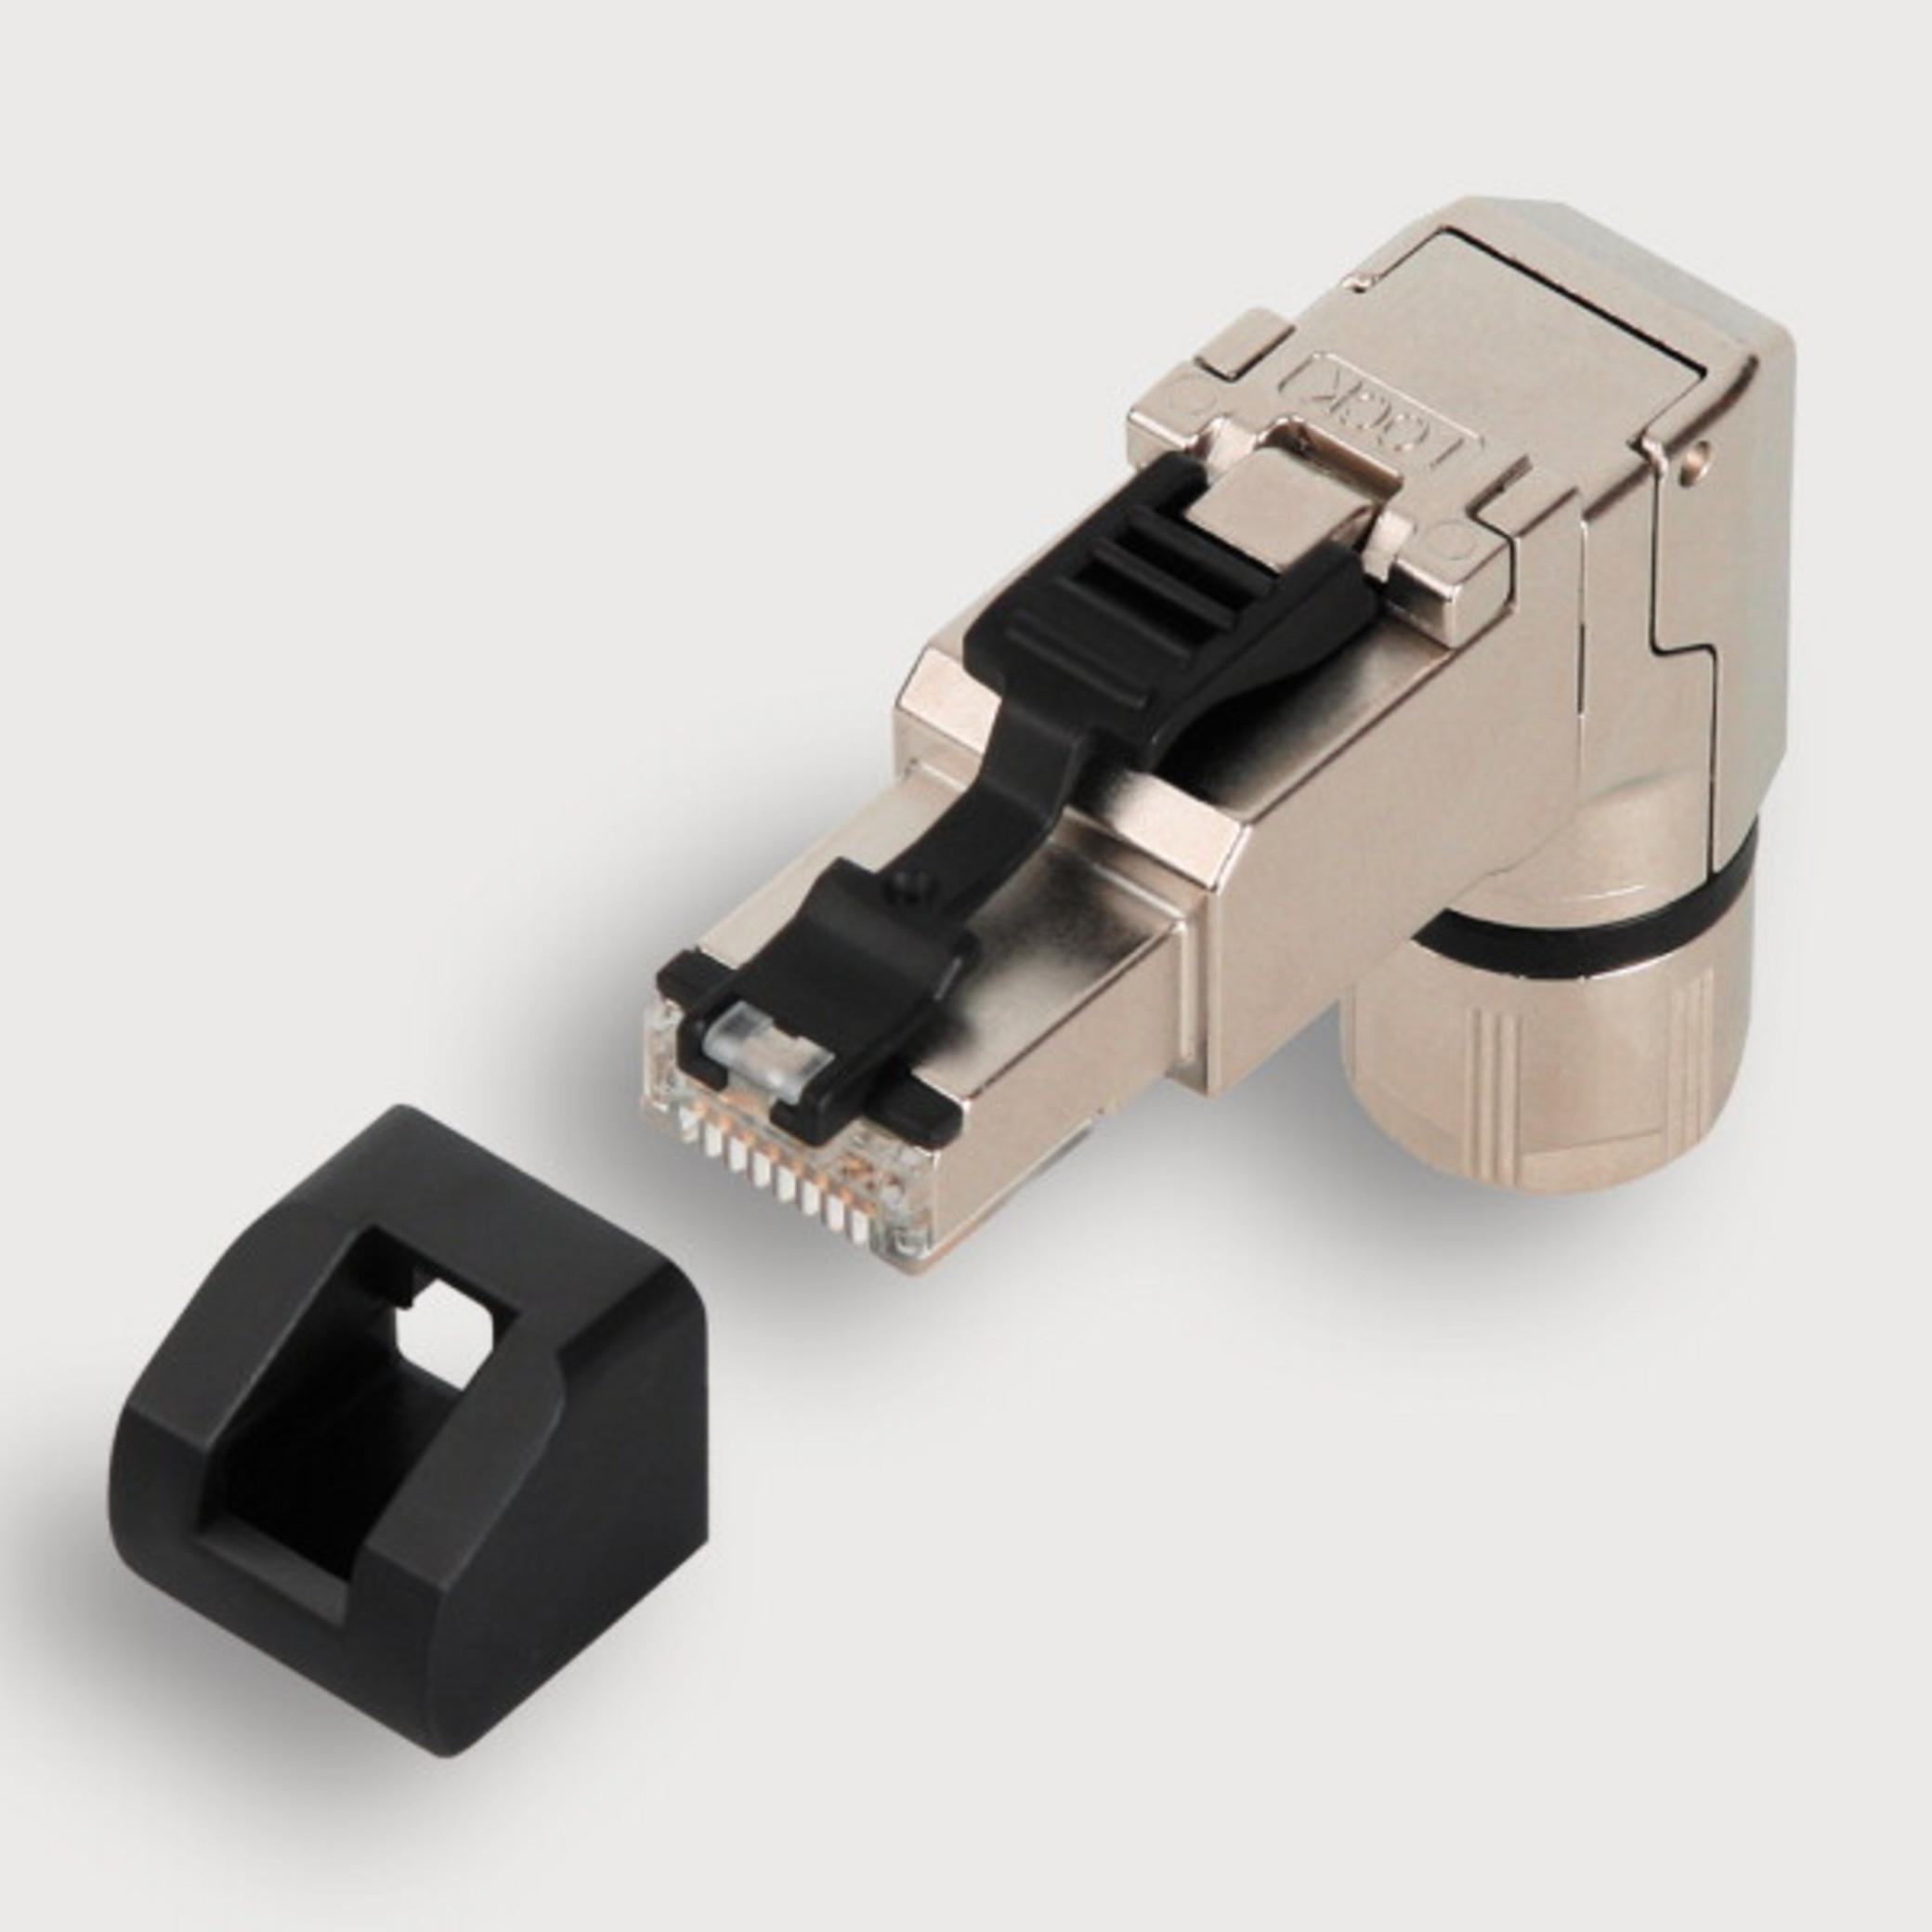 490152 Rj45 Connector Lutze Inc Jack Wiring Color